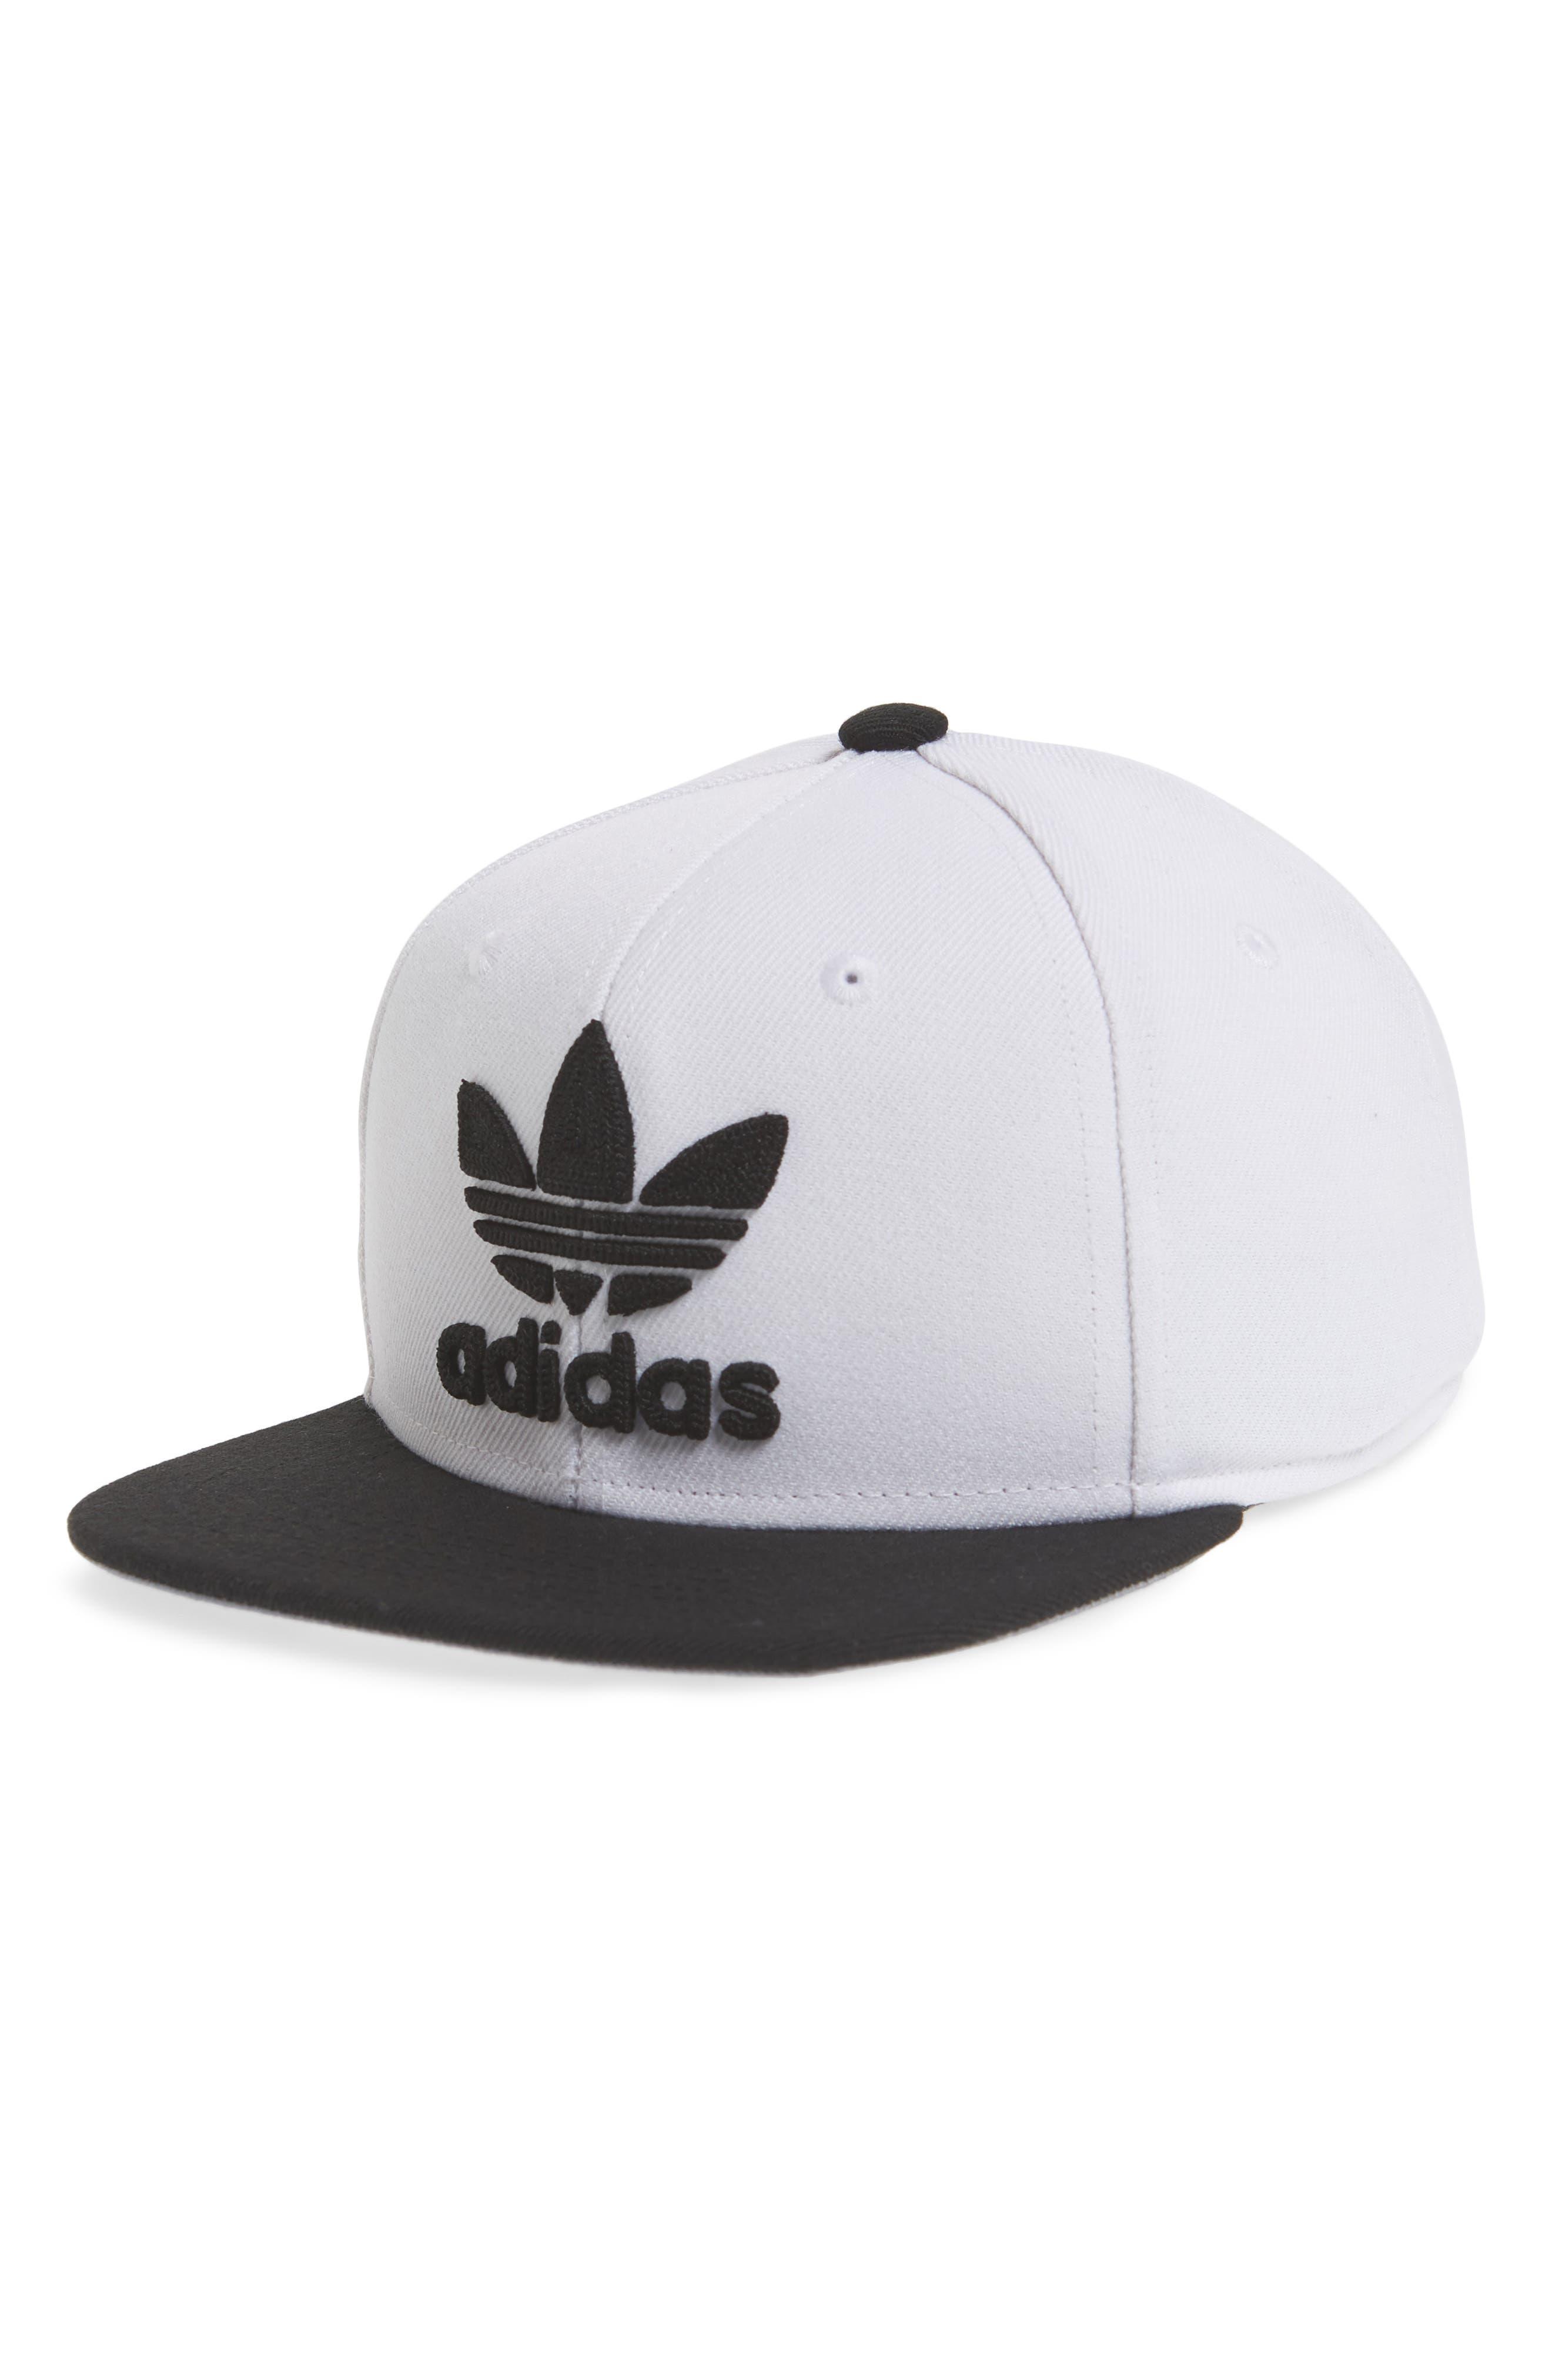 Originals Snapback Hat,                         Main,                         color, White/ Black